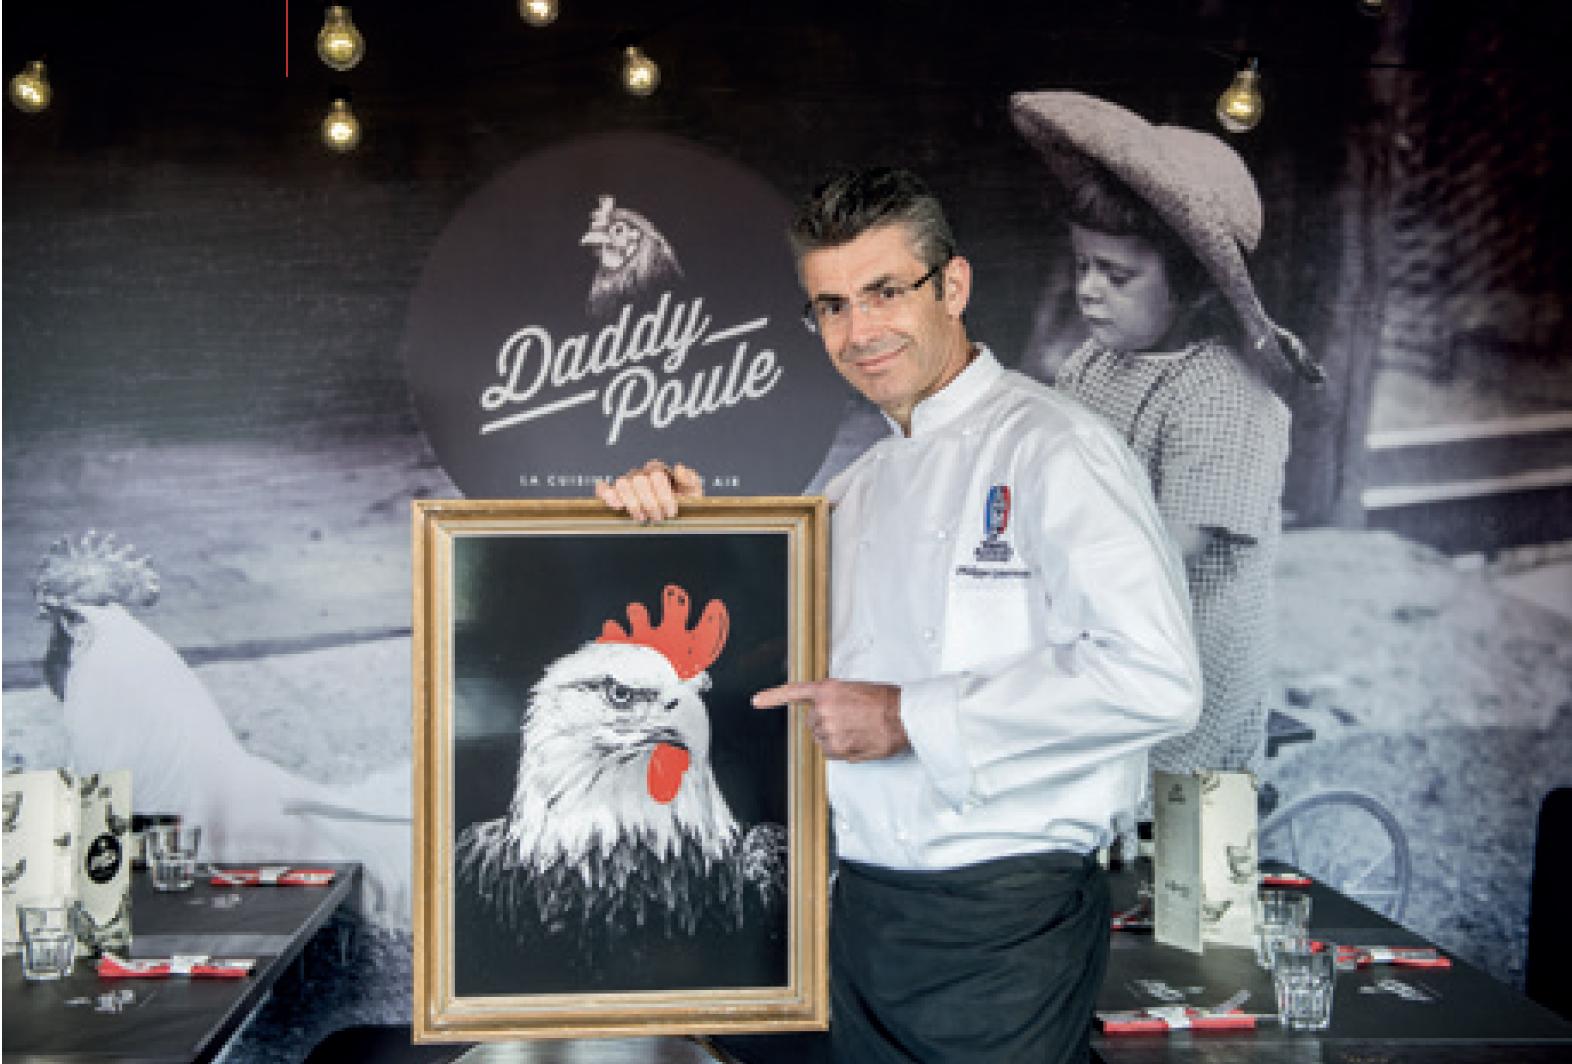 Restaurant Daddy Poule - Philippe GAUVREAU